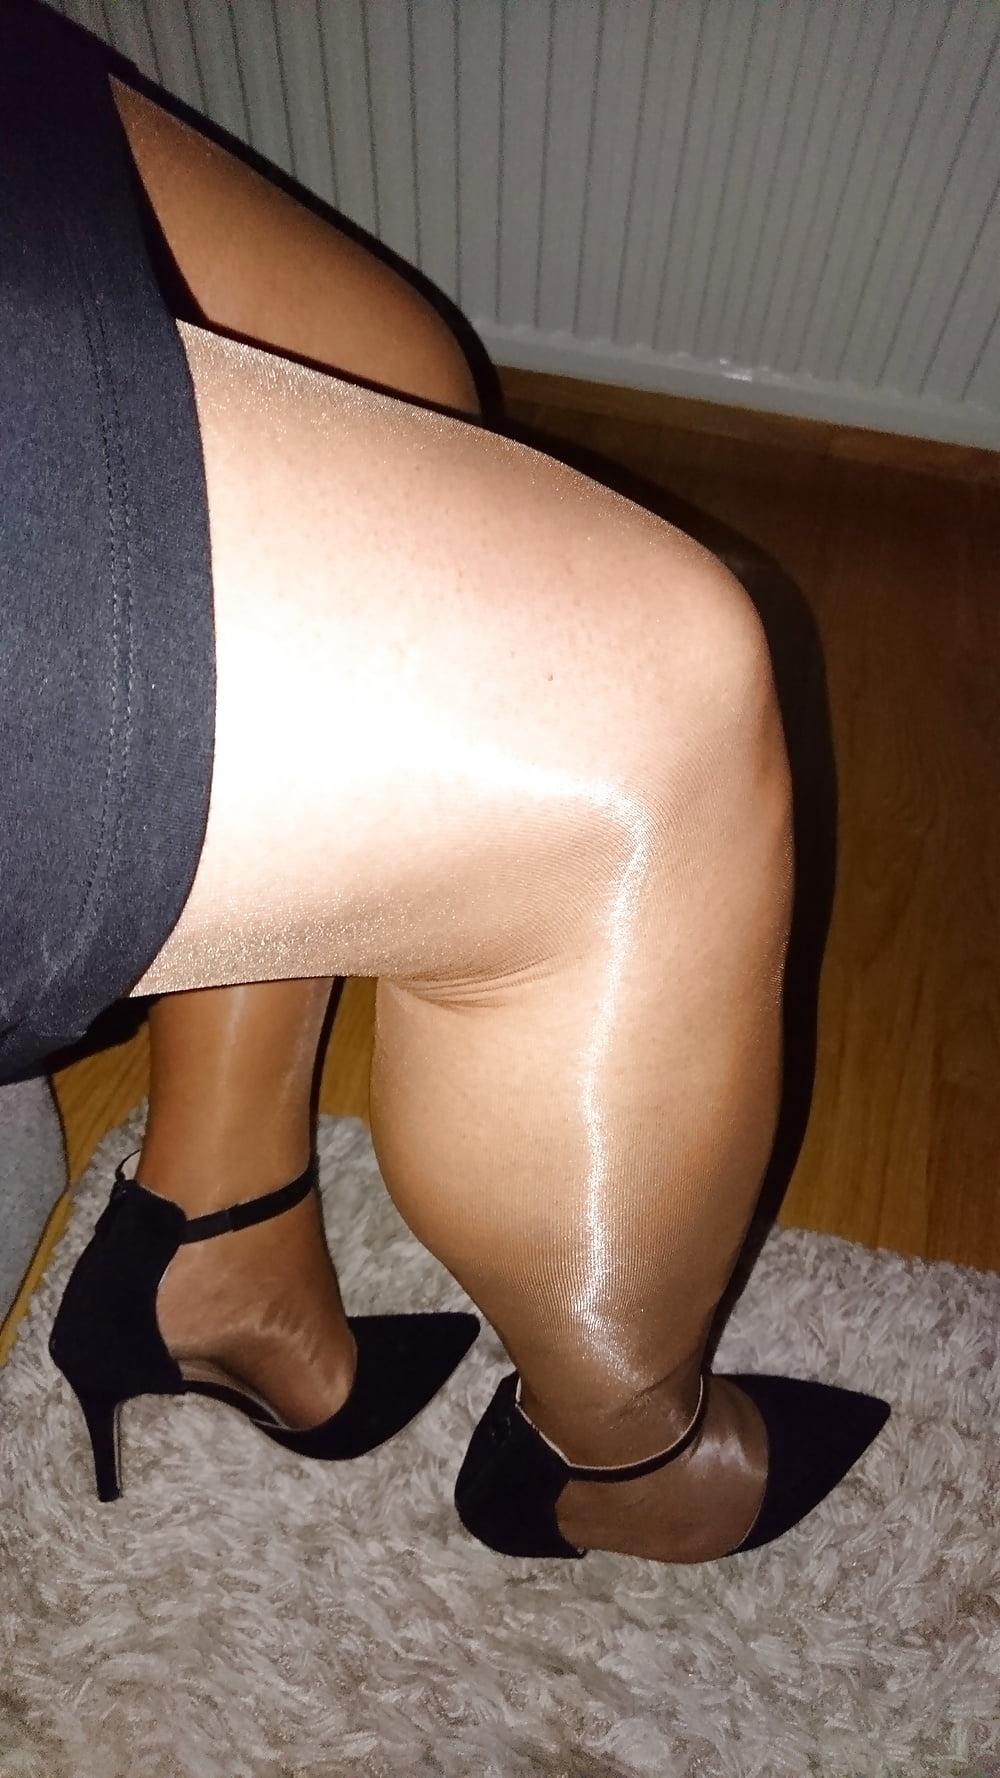 Bare wifey ass pics